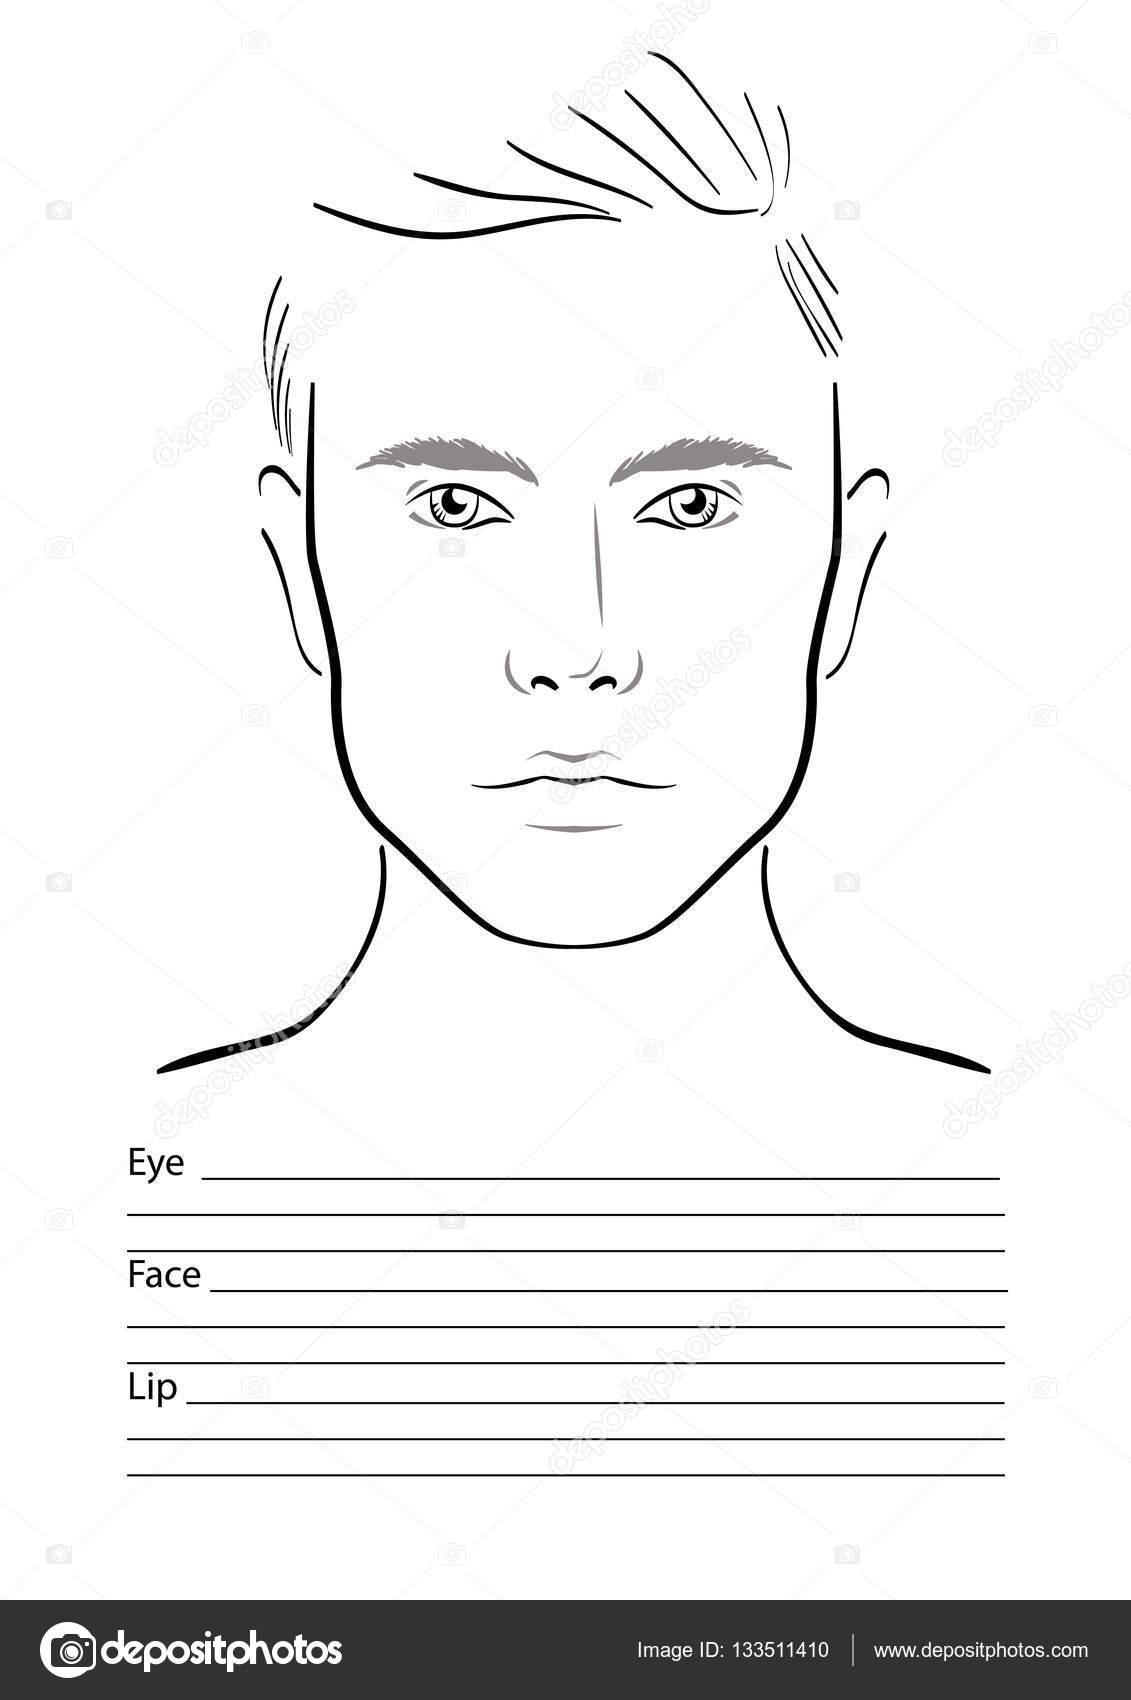 Marvelous Face Diagram Smink Muvesz Ures Sablon Vektoros Illusztracio Wiring Digital Resources Nekoutcompassionincorg